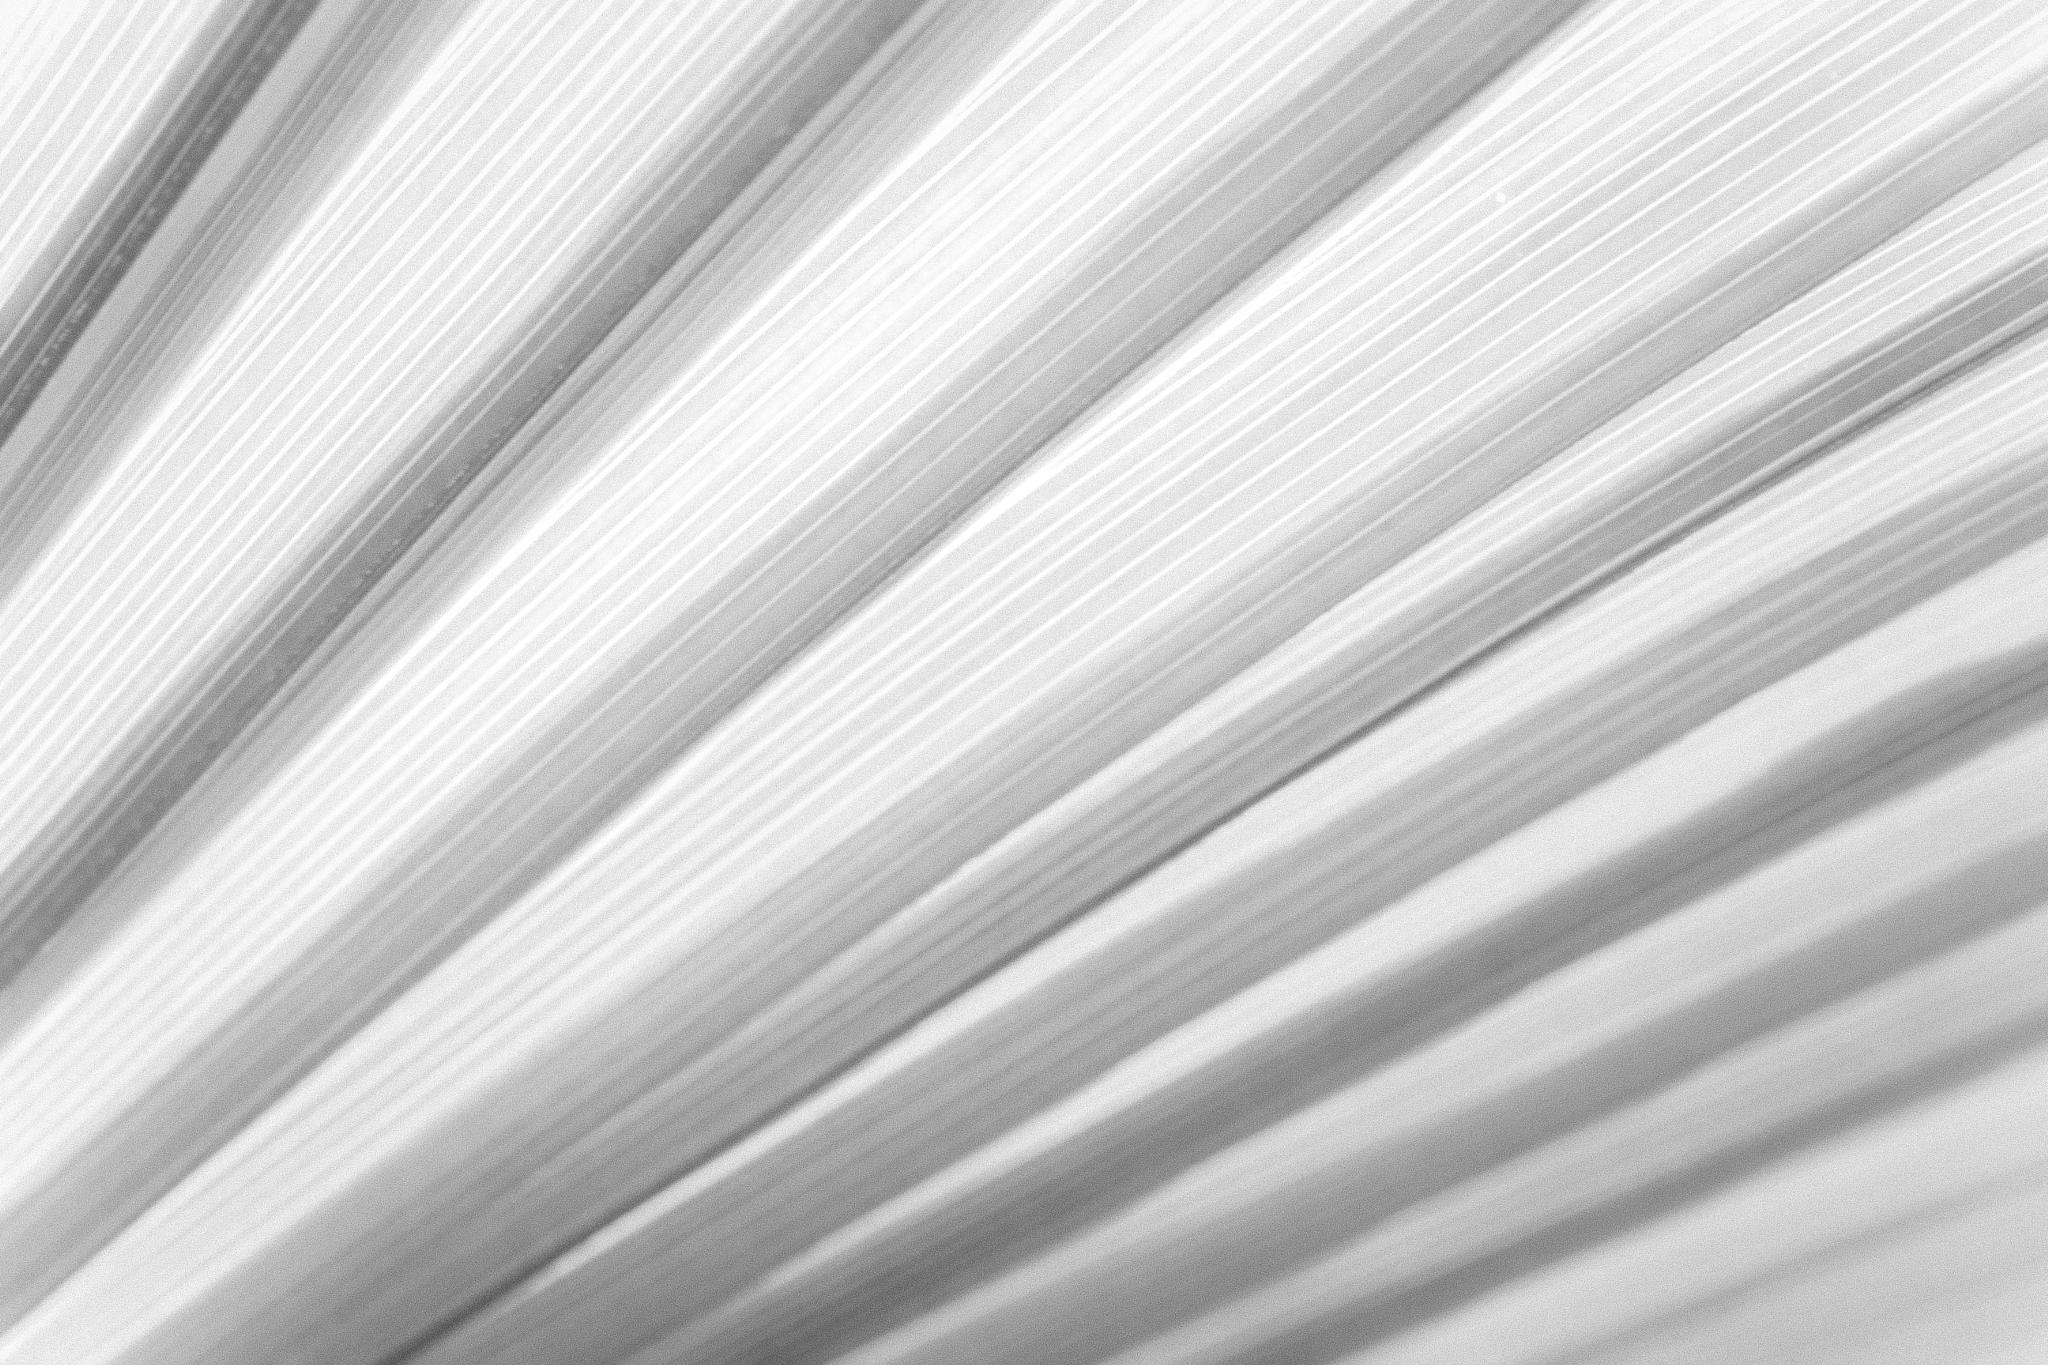 pinstripes by Markus Koenigsbeck